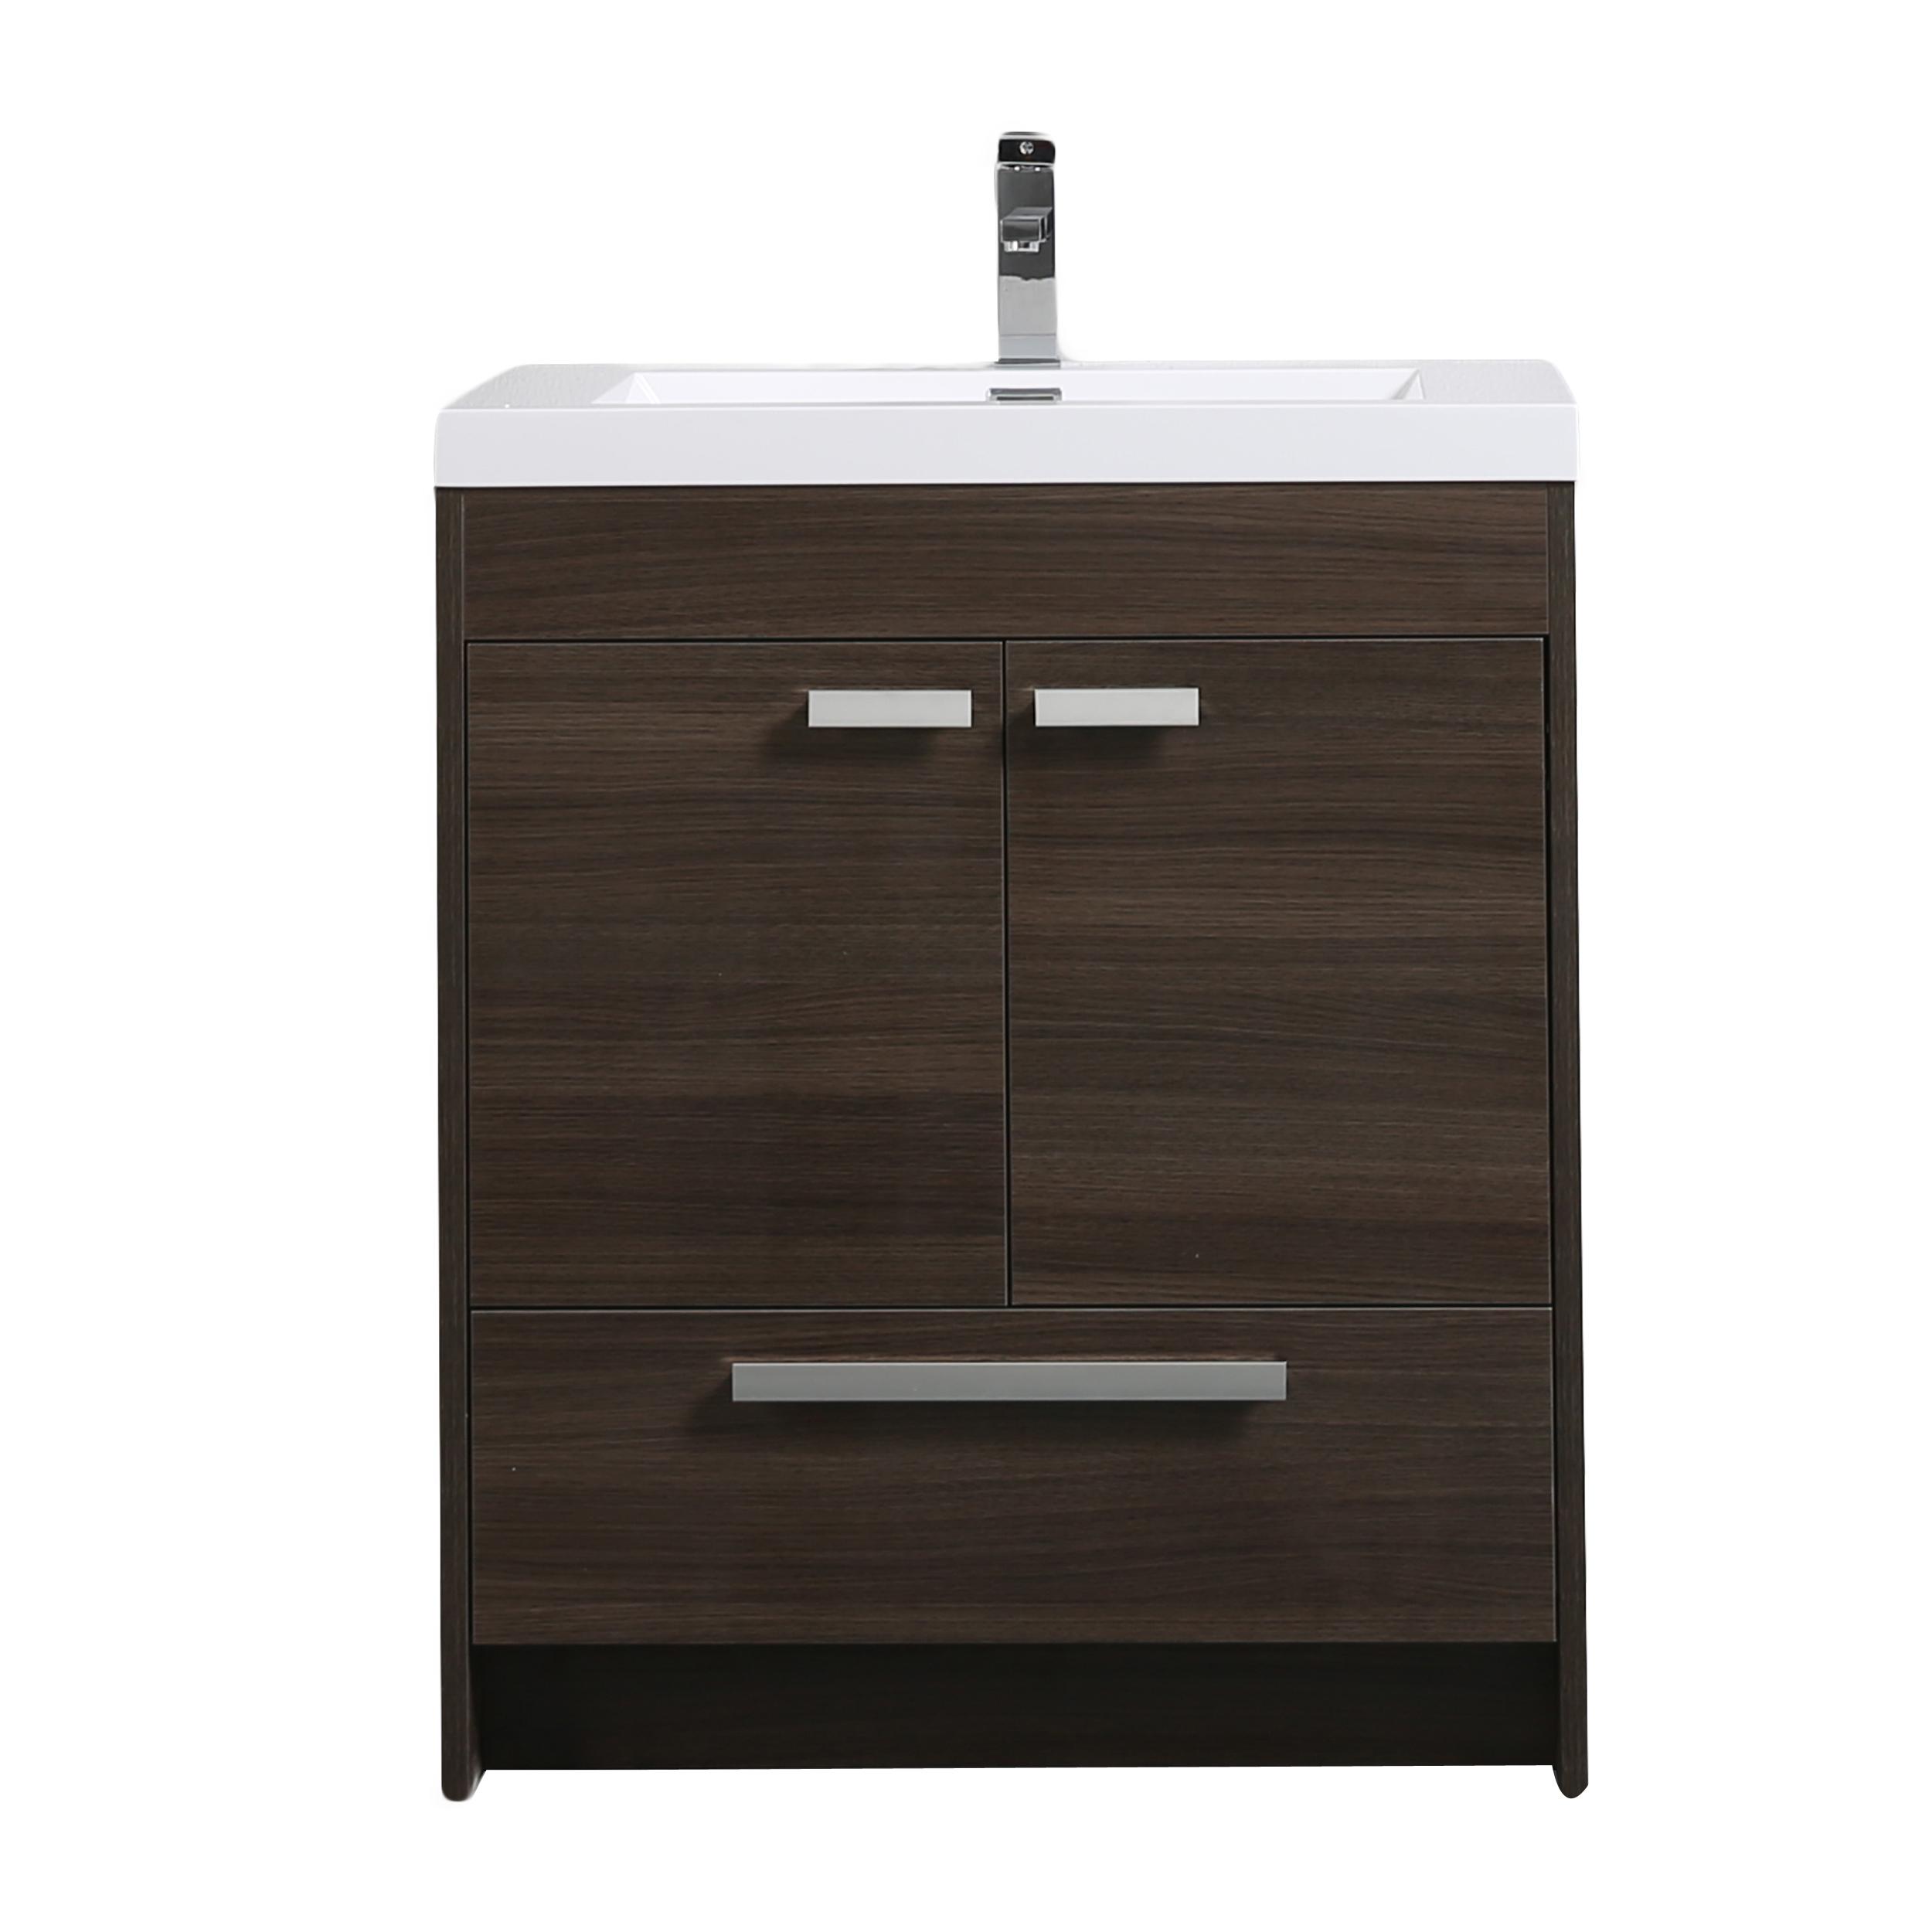 Eviva Lugano 30 Grey Oak Modern Bathroom Vanity